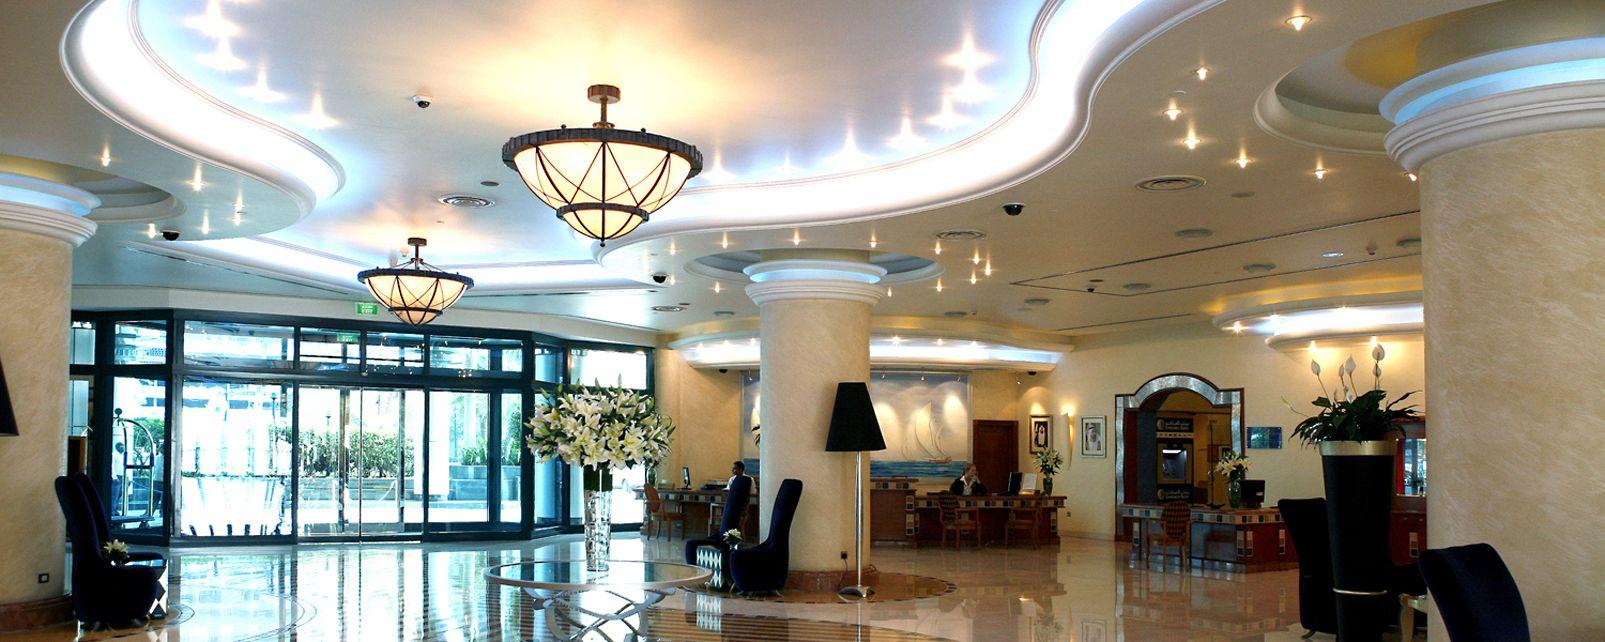 Hotel Meridien Mina Seyahi